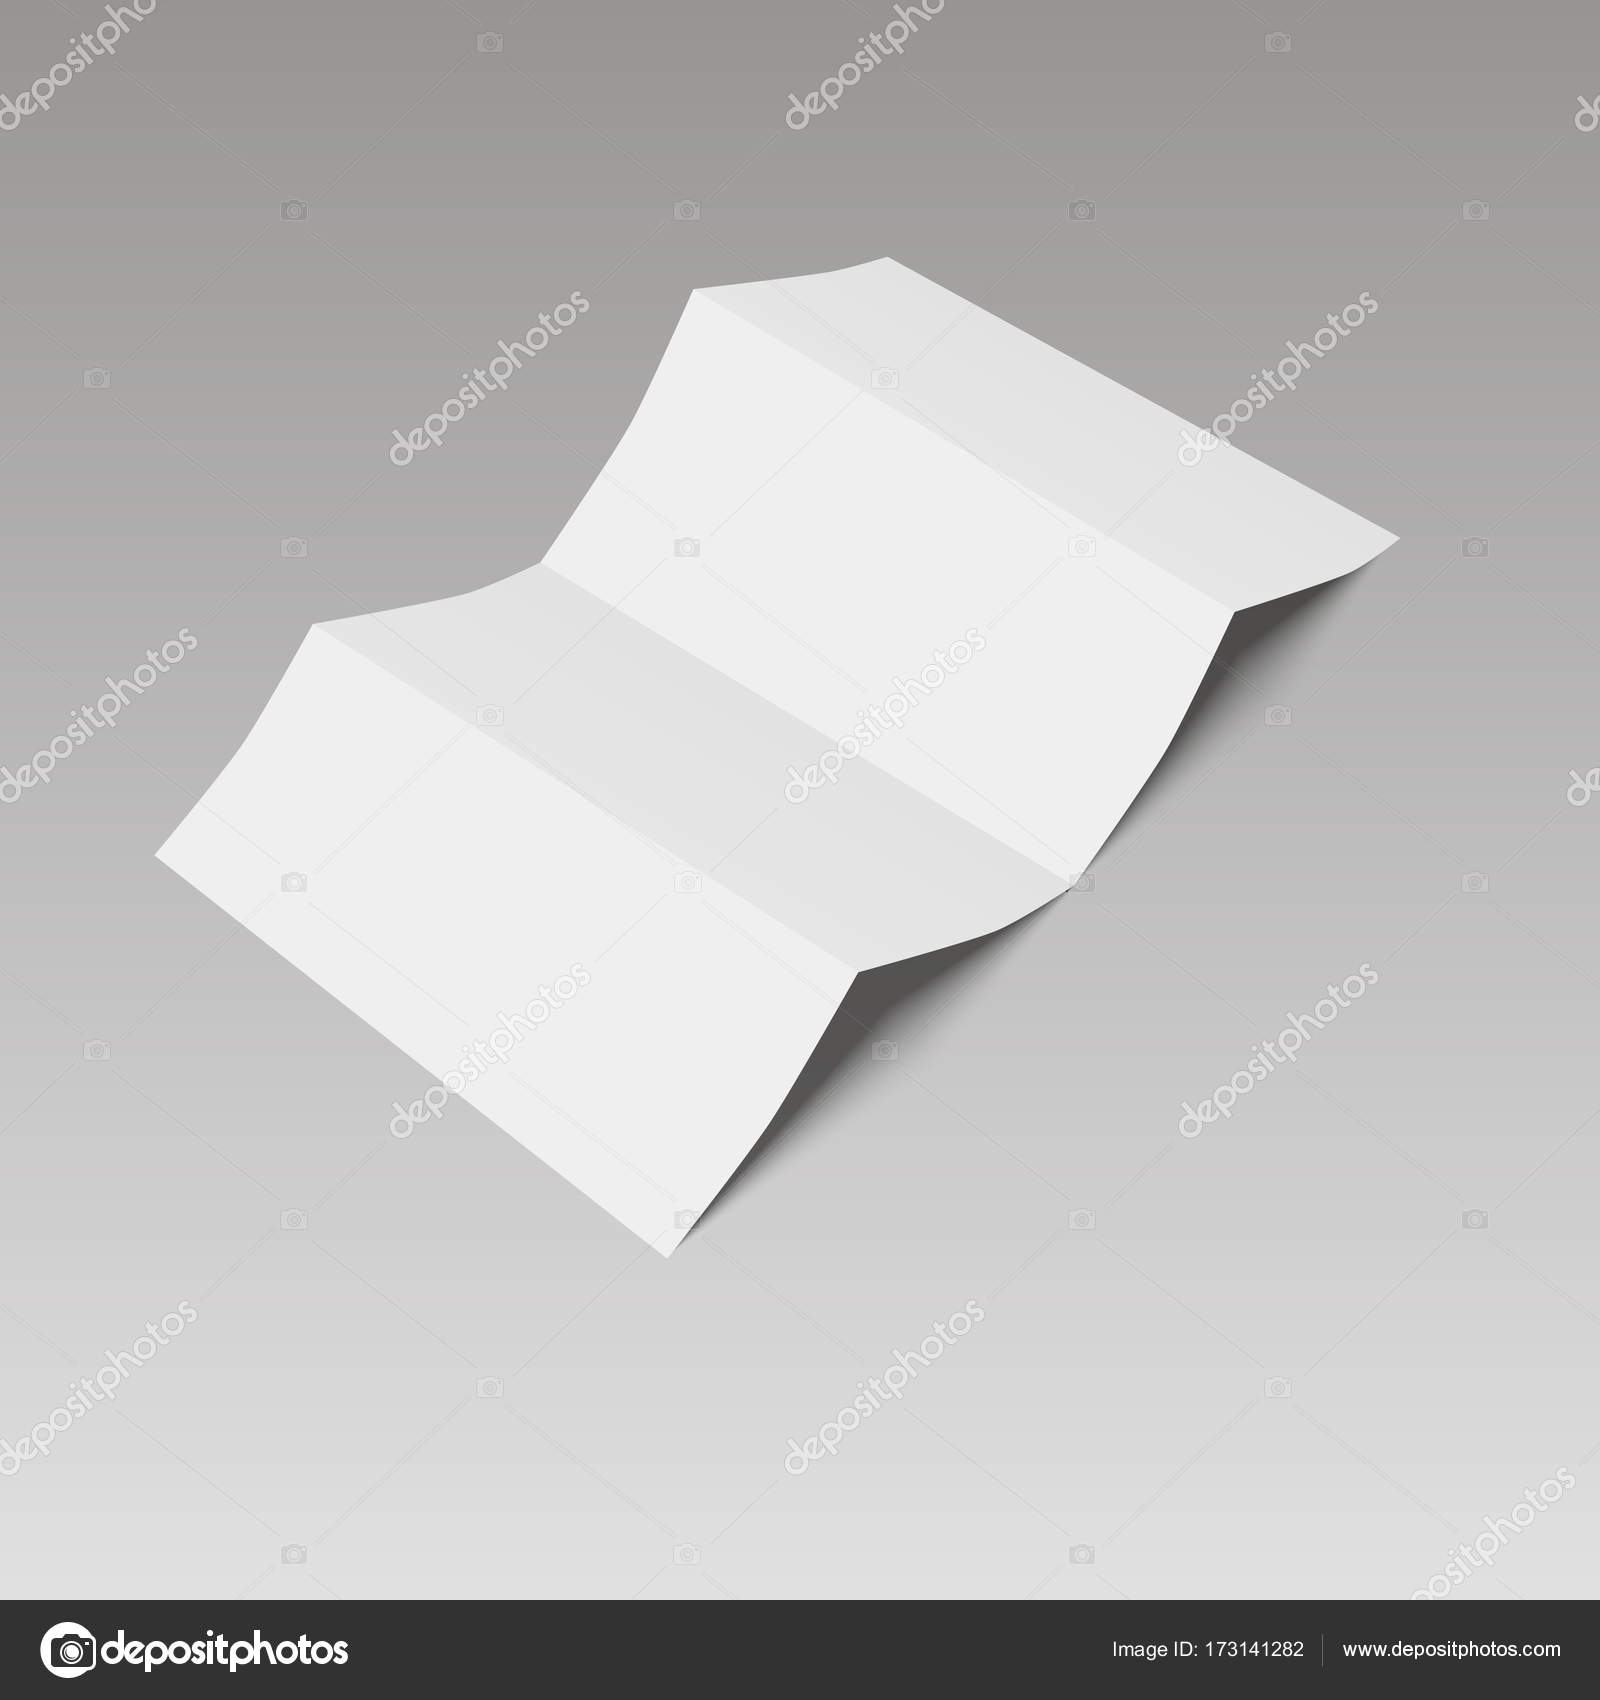 Leere vier Falten Falten Papier-Broschüre, Flyer, Broadsheet. Vektor ...